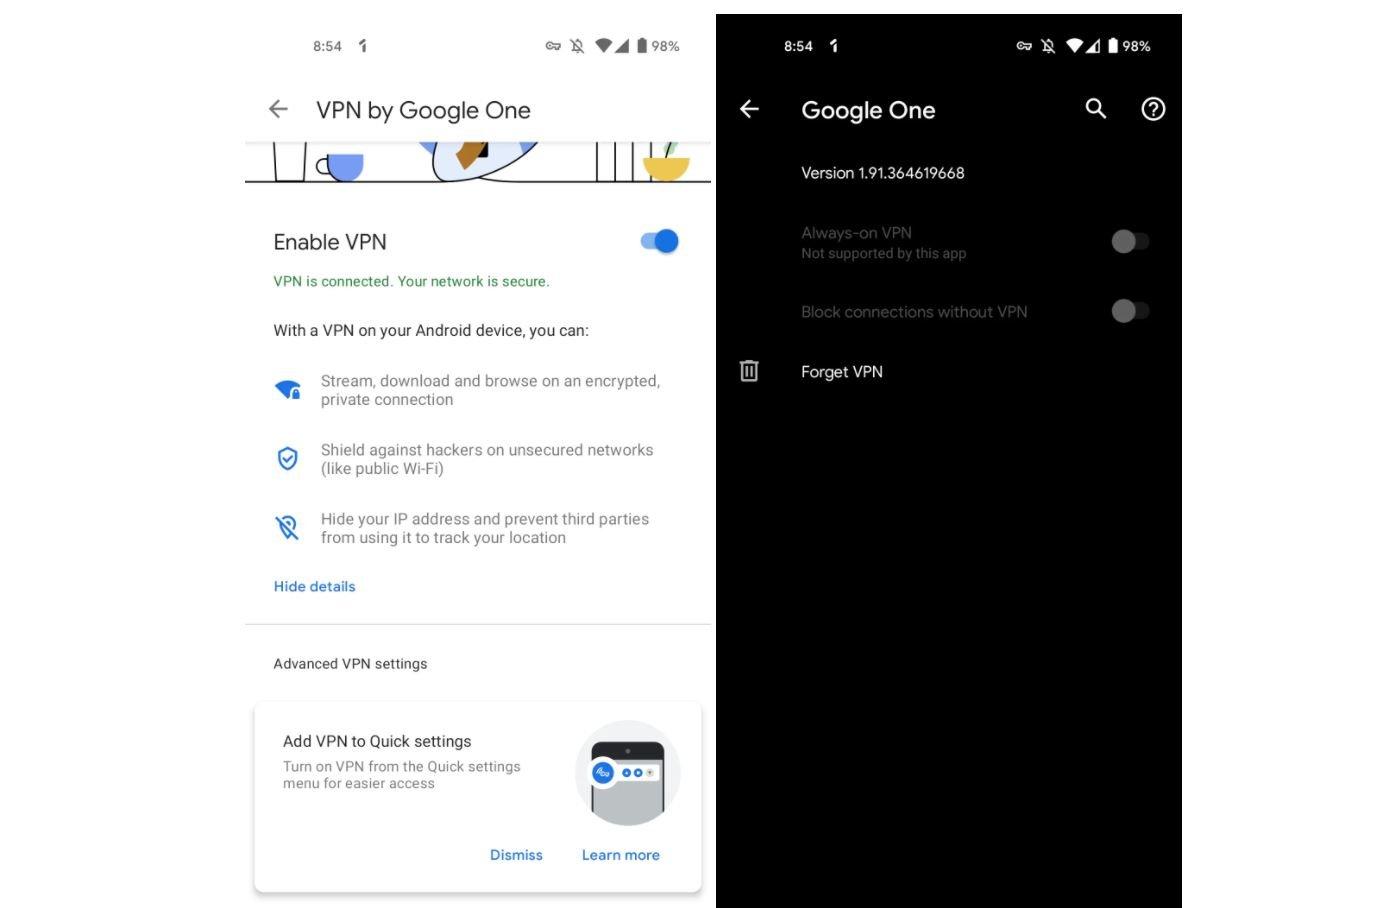 google one vpn screenshot